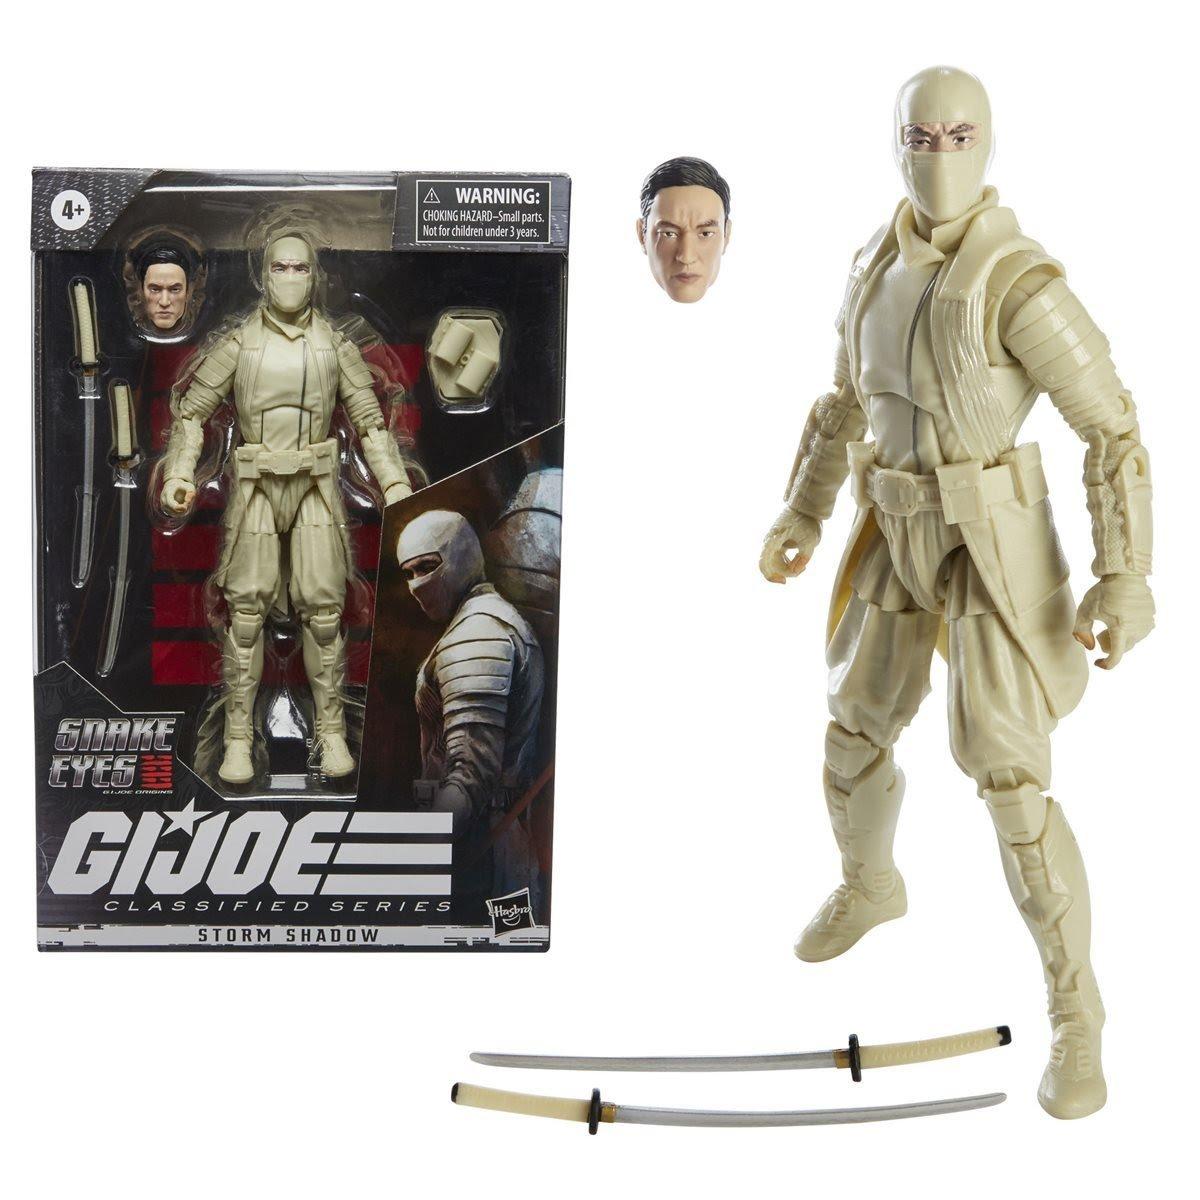 Storm Shadow - GI Joe Classified Series - Snake Eyes Origins Action Figure